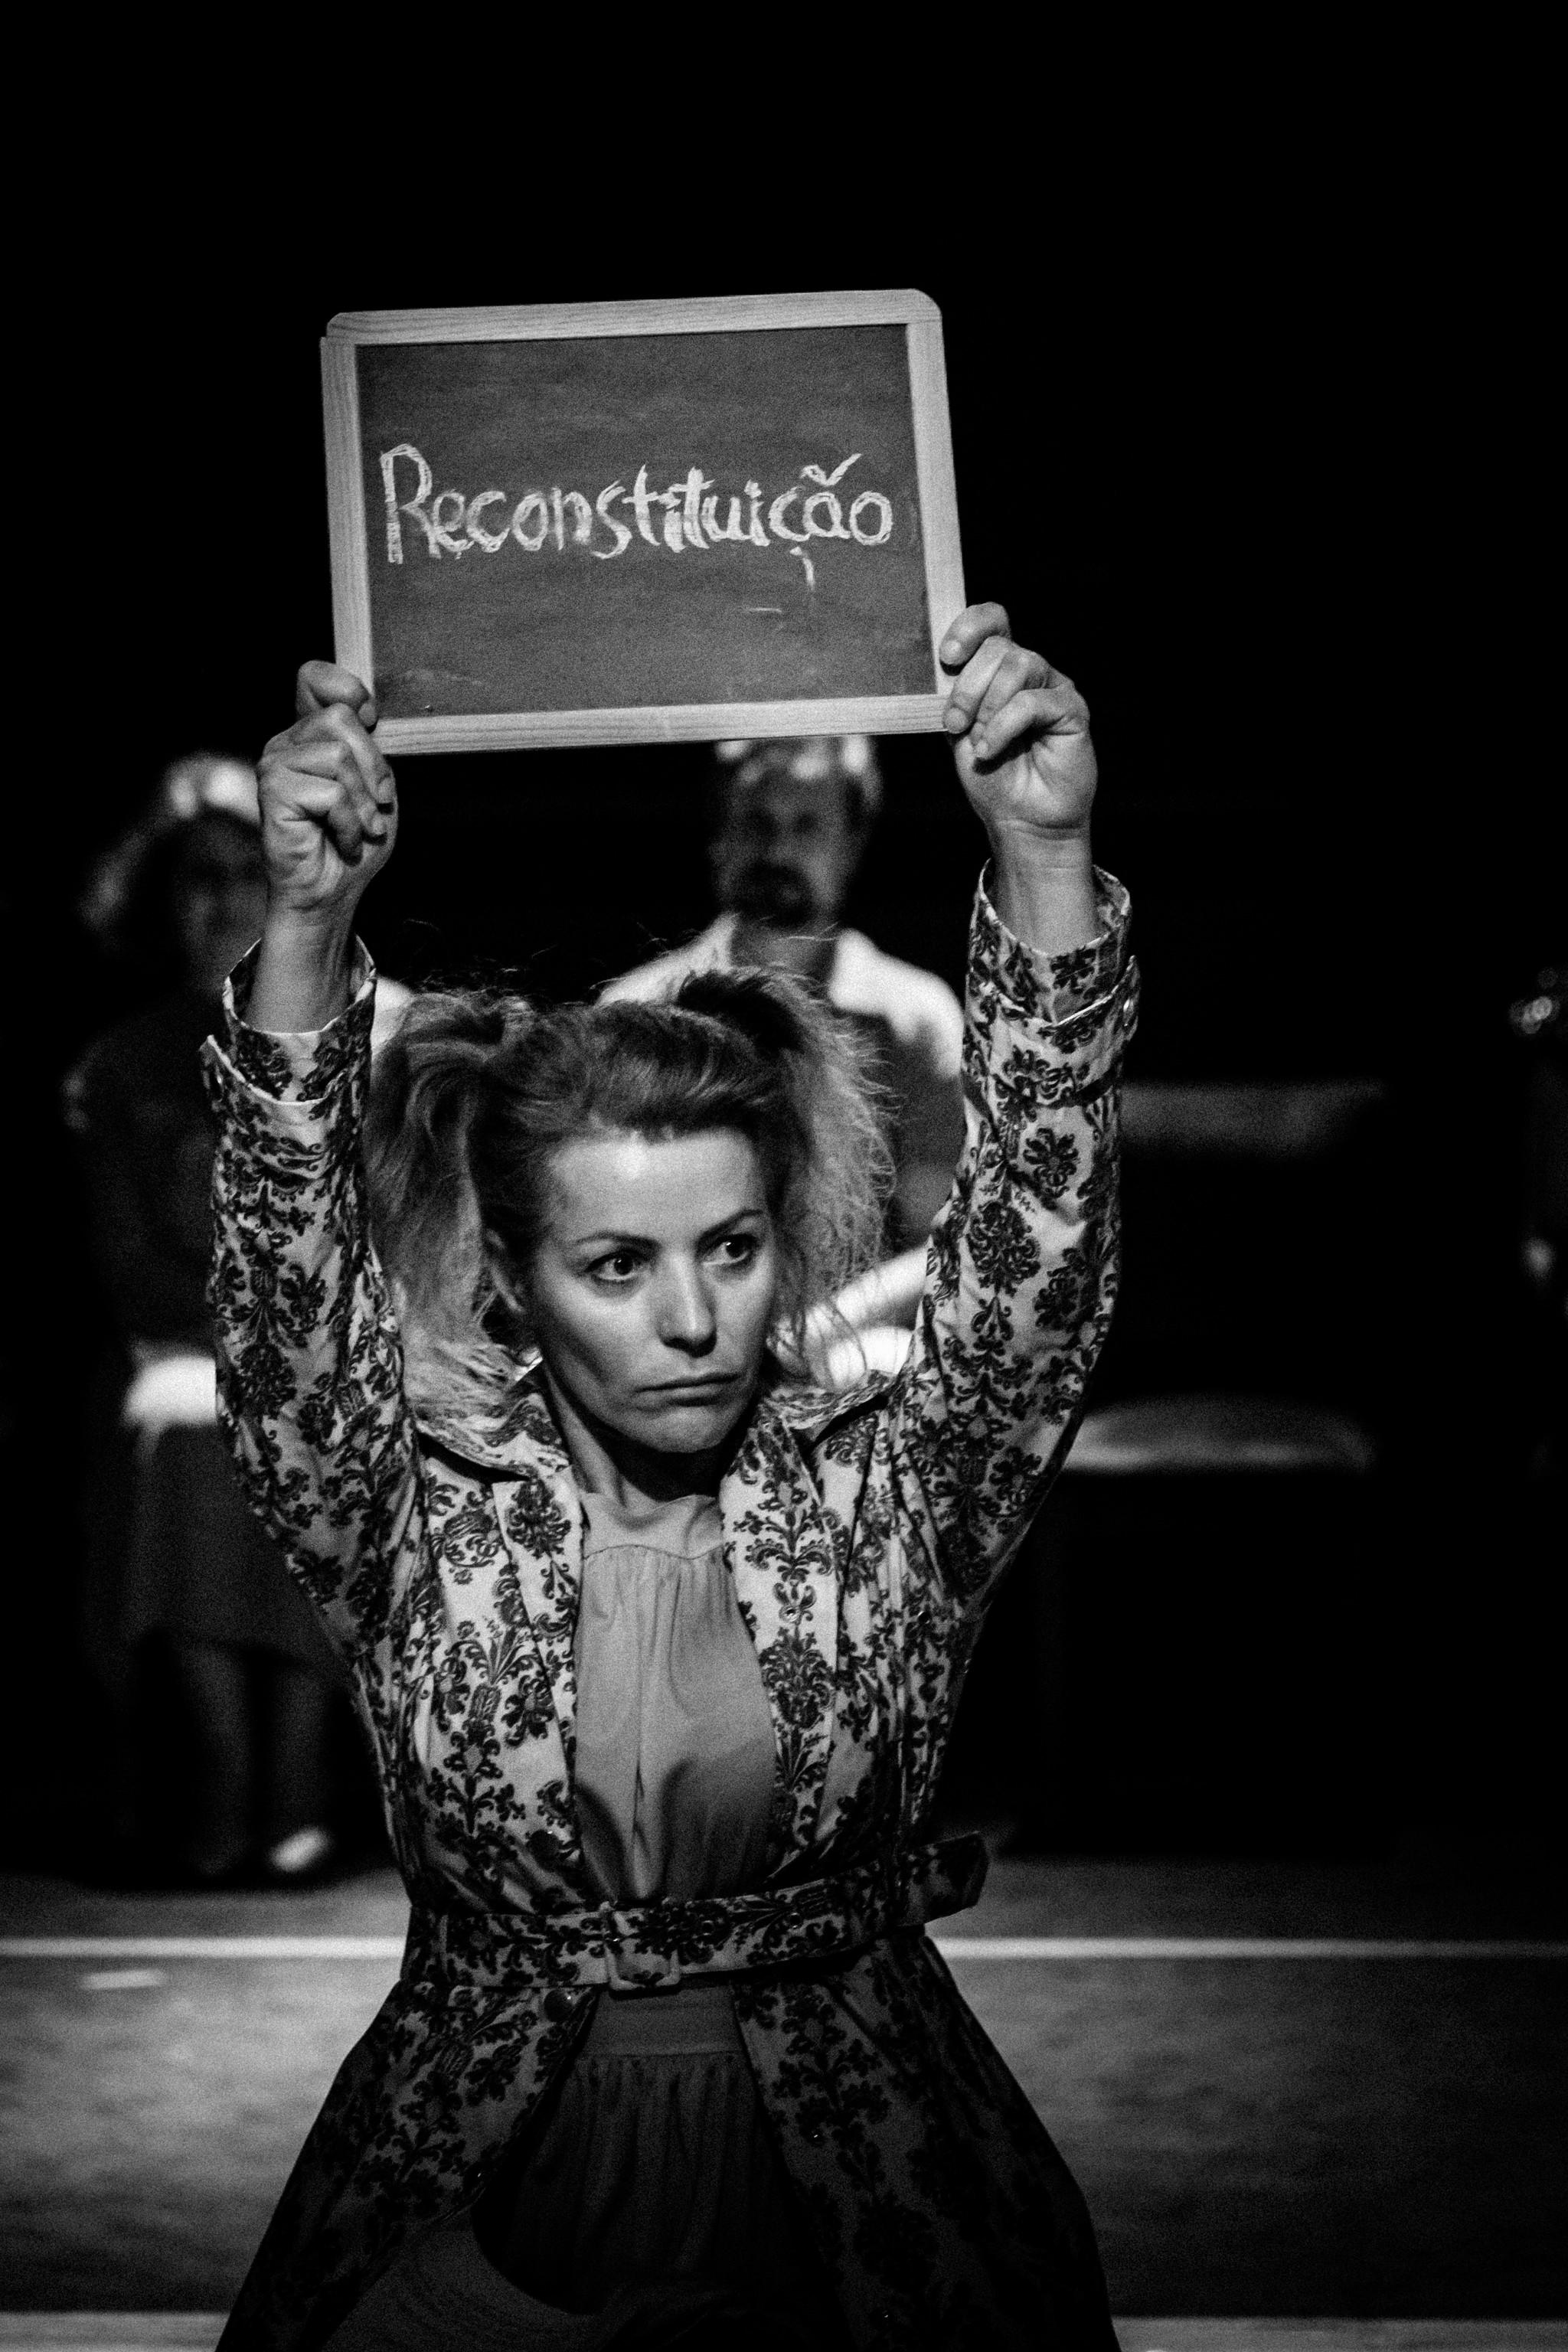 Ocupaçã_fotos de ensaio_Estelle Valente Teatro São Luiz (3).jpg